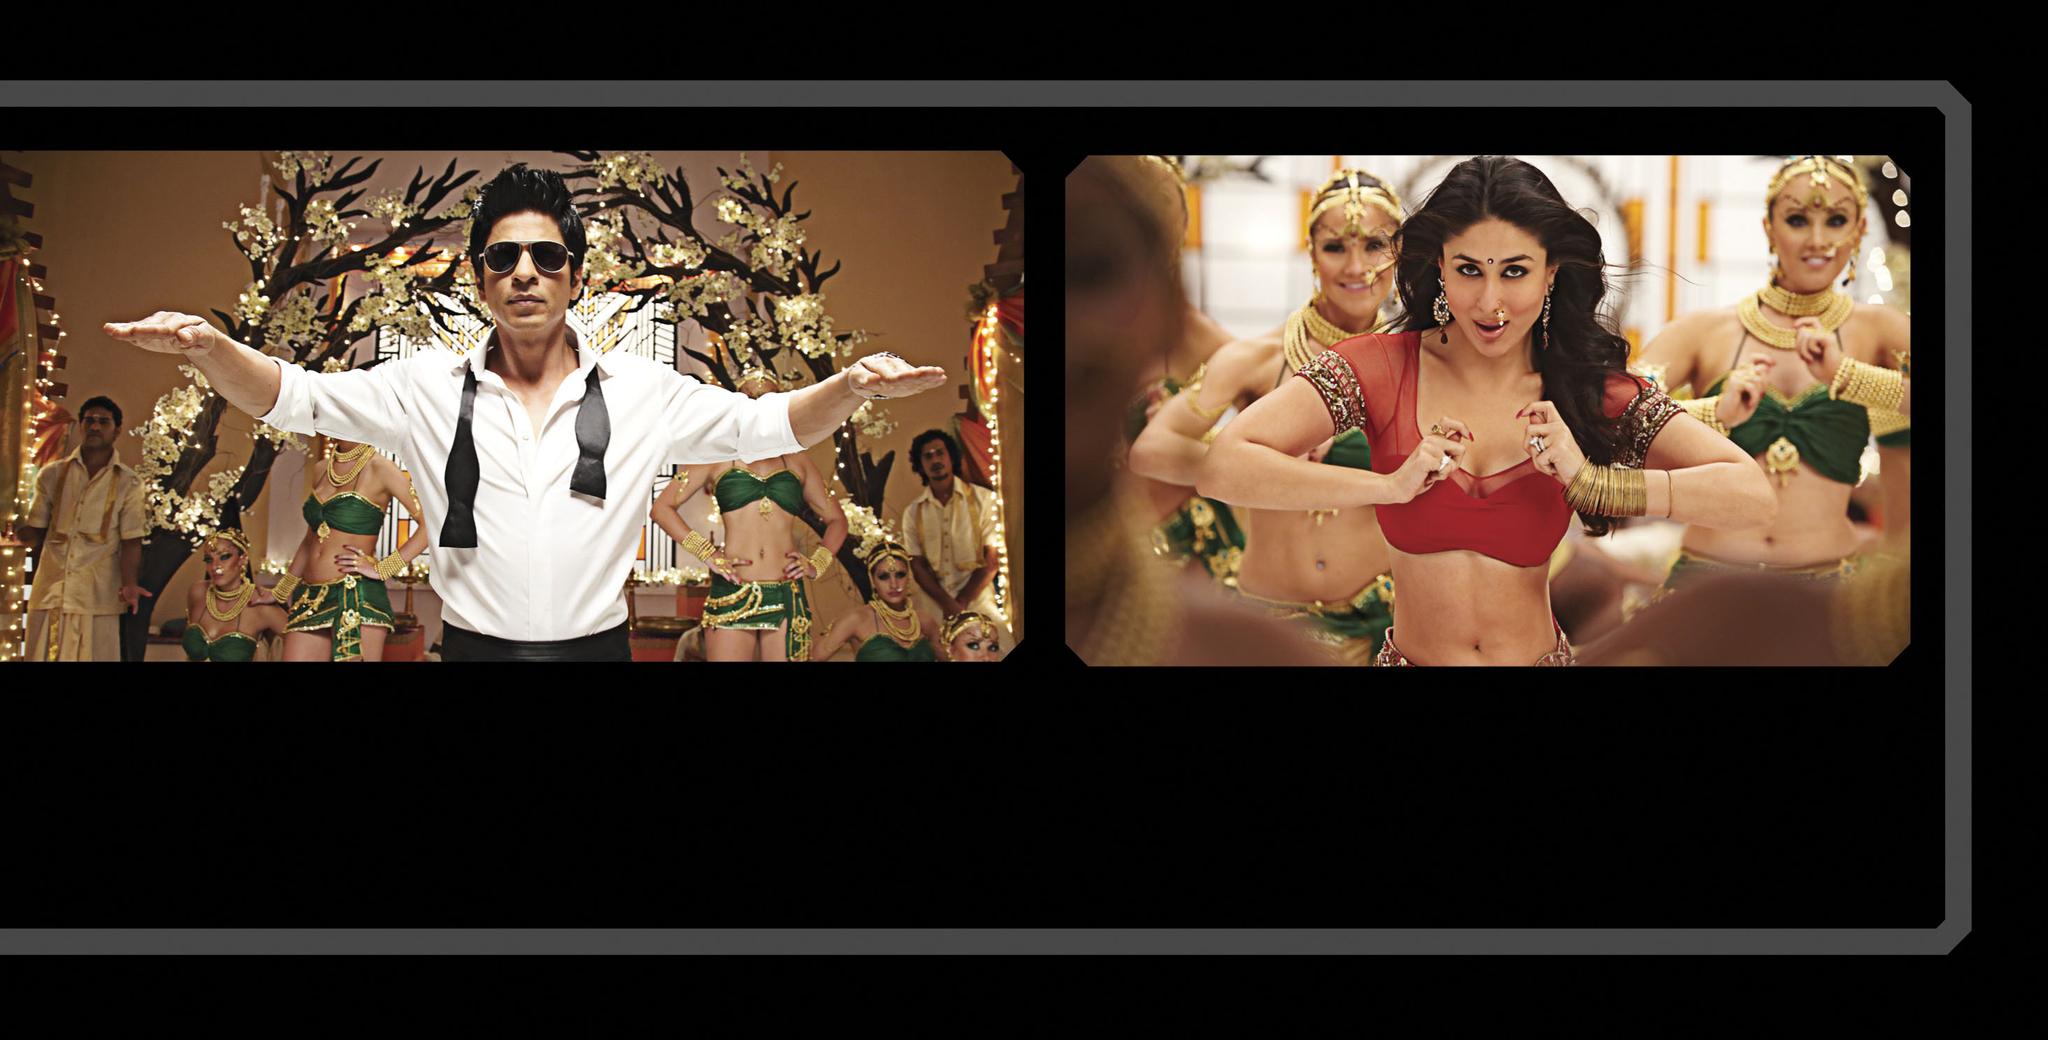 Kareena Kapoor and Shah Rukh Khan in Ra.One (2011)